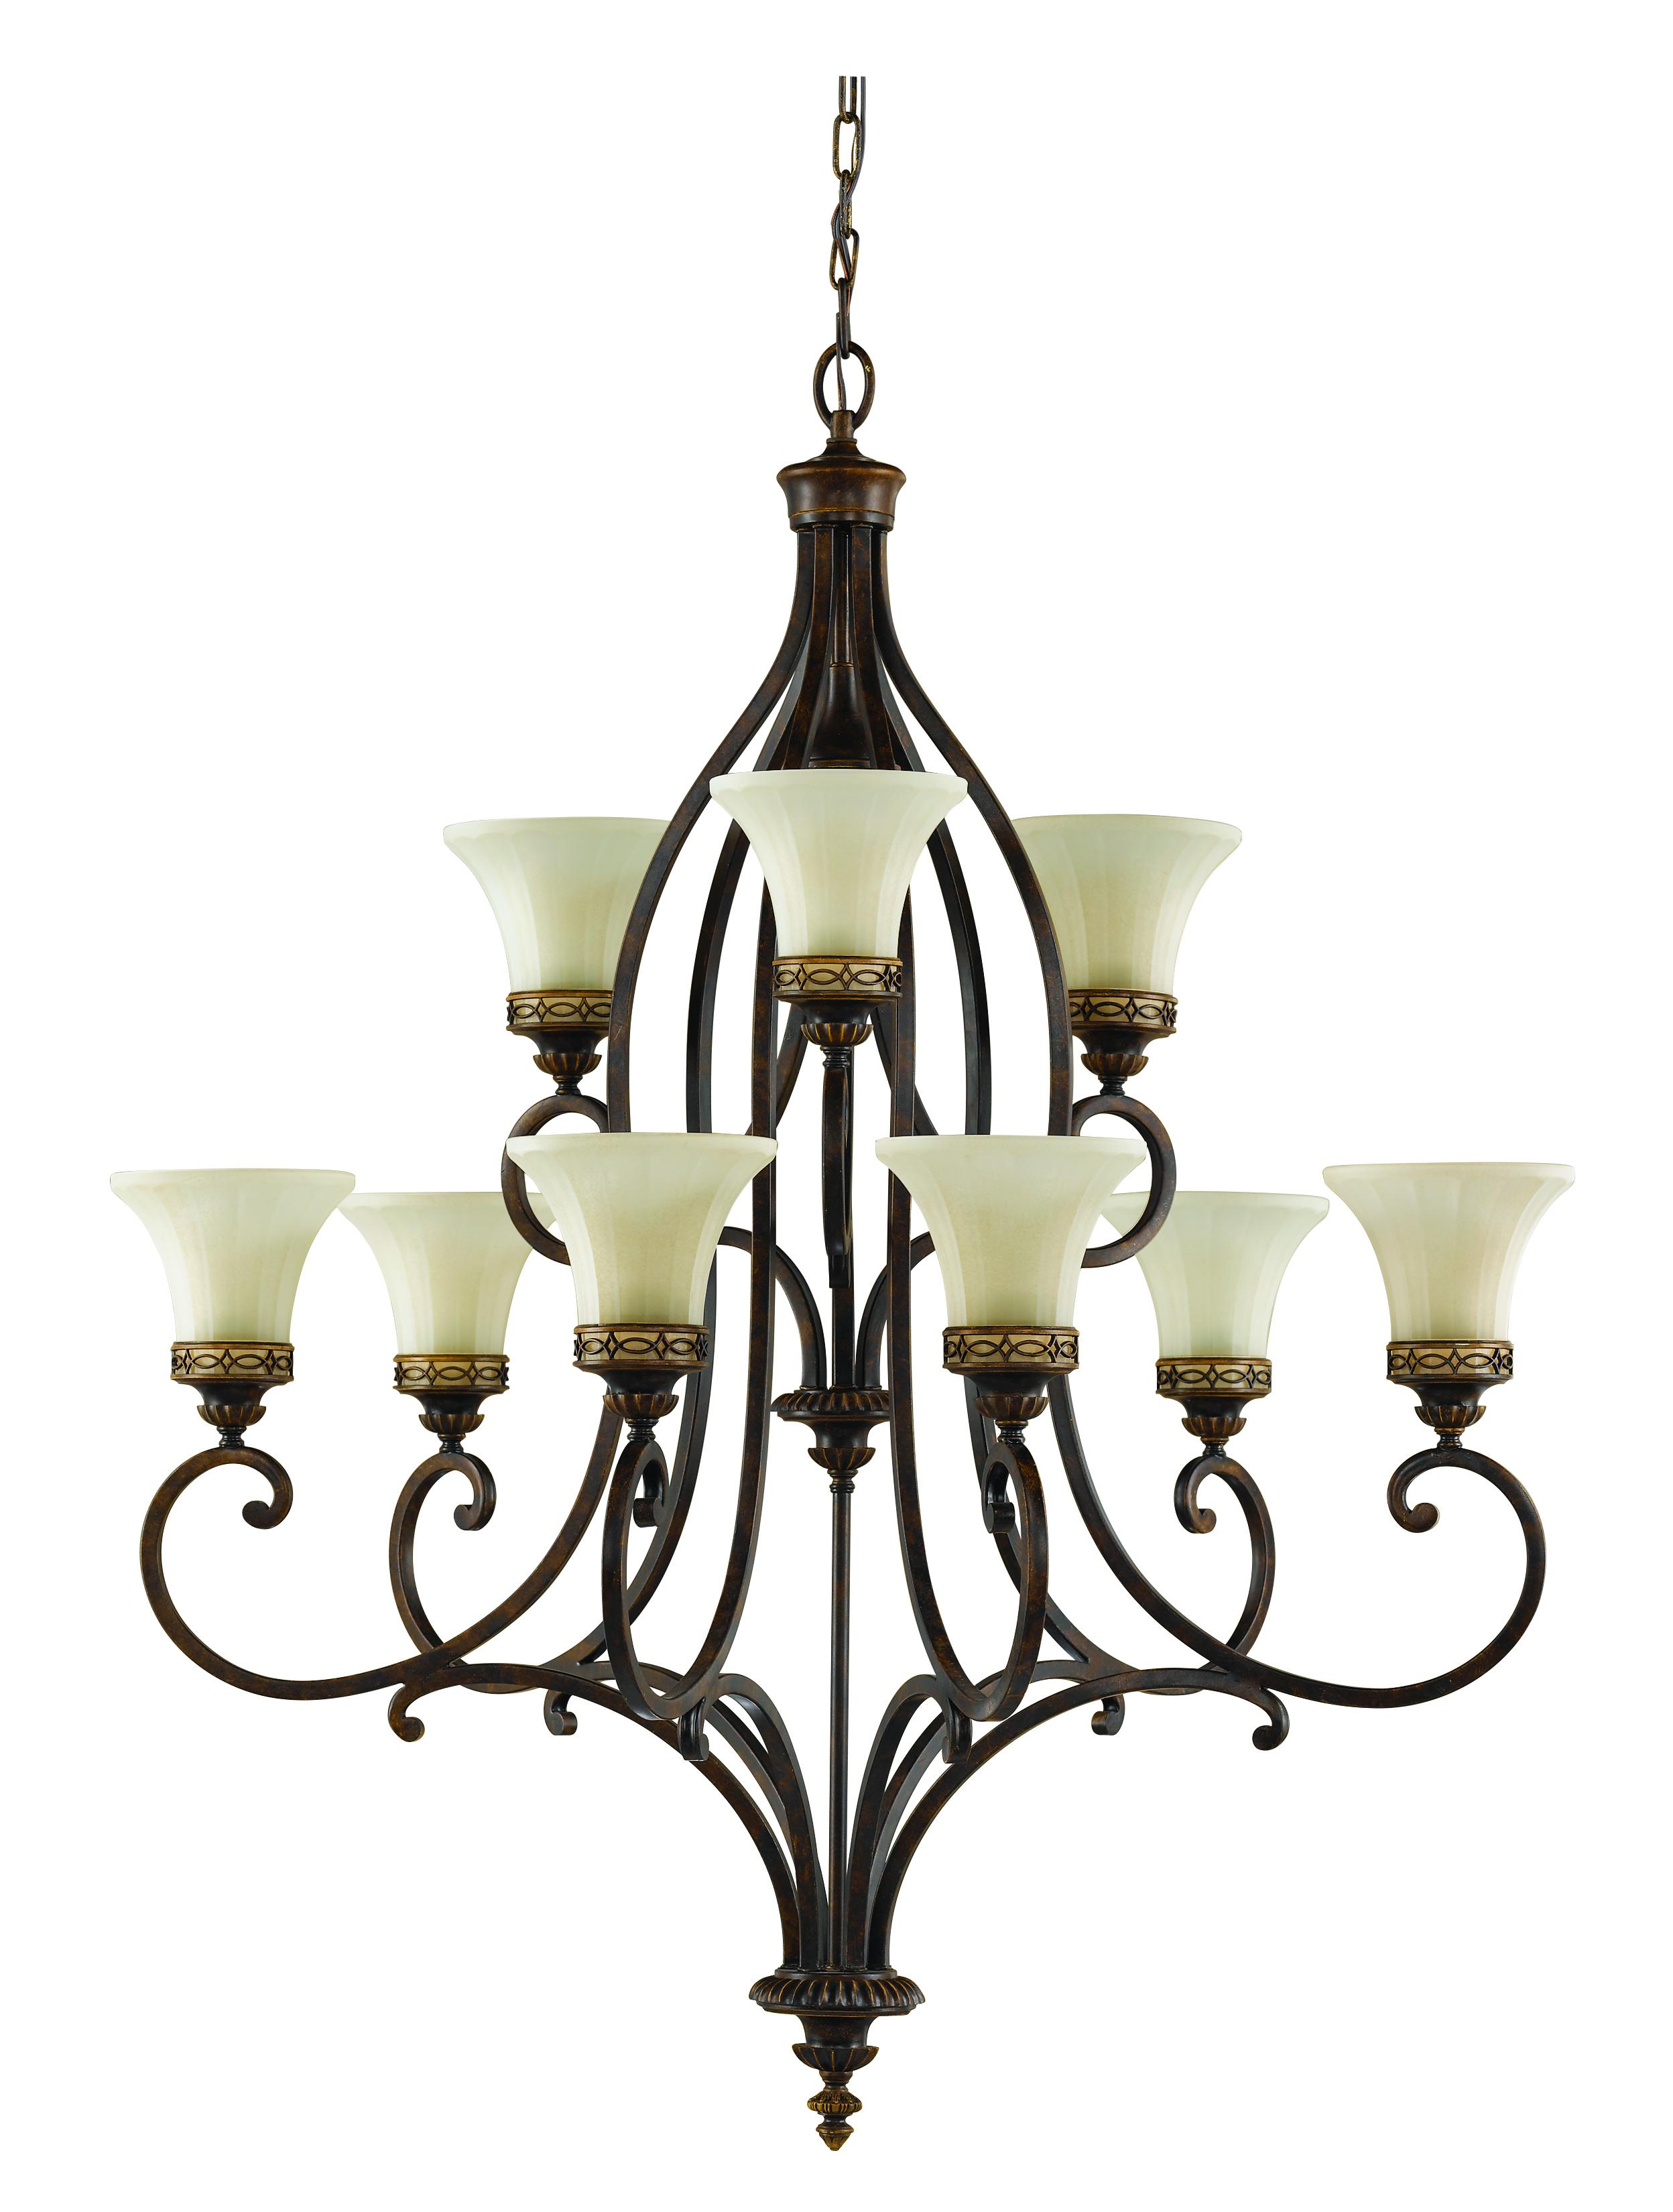 of designs small luxury ikea tadpoles chandeliers black for chandelier best